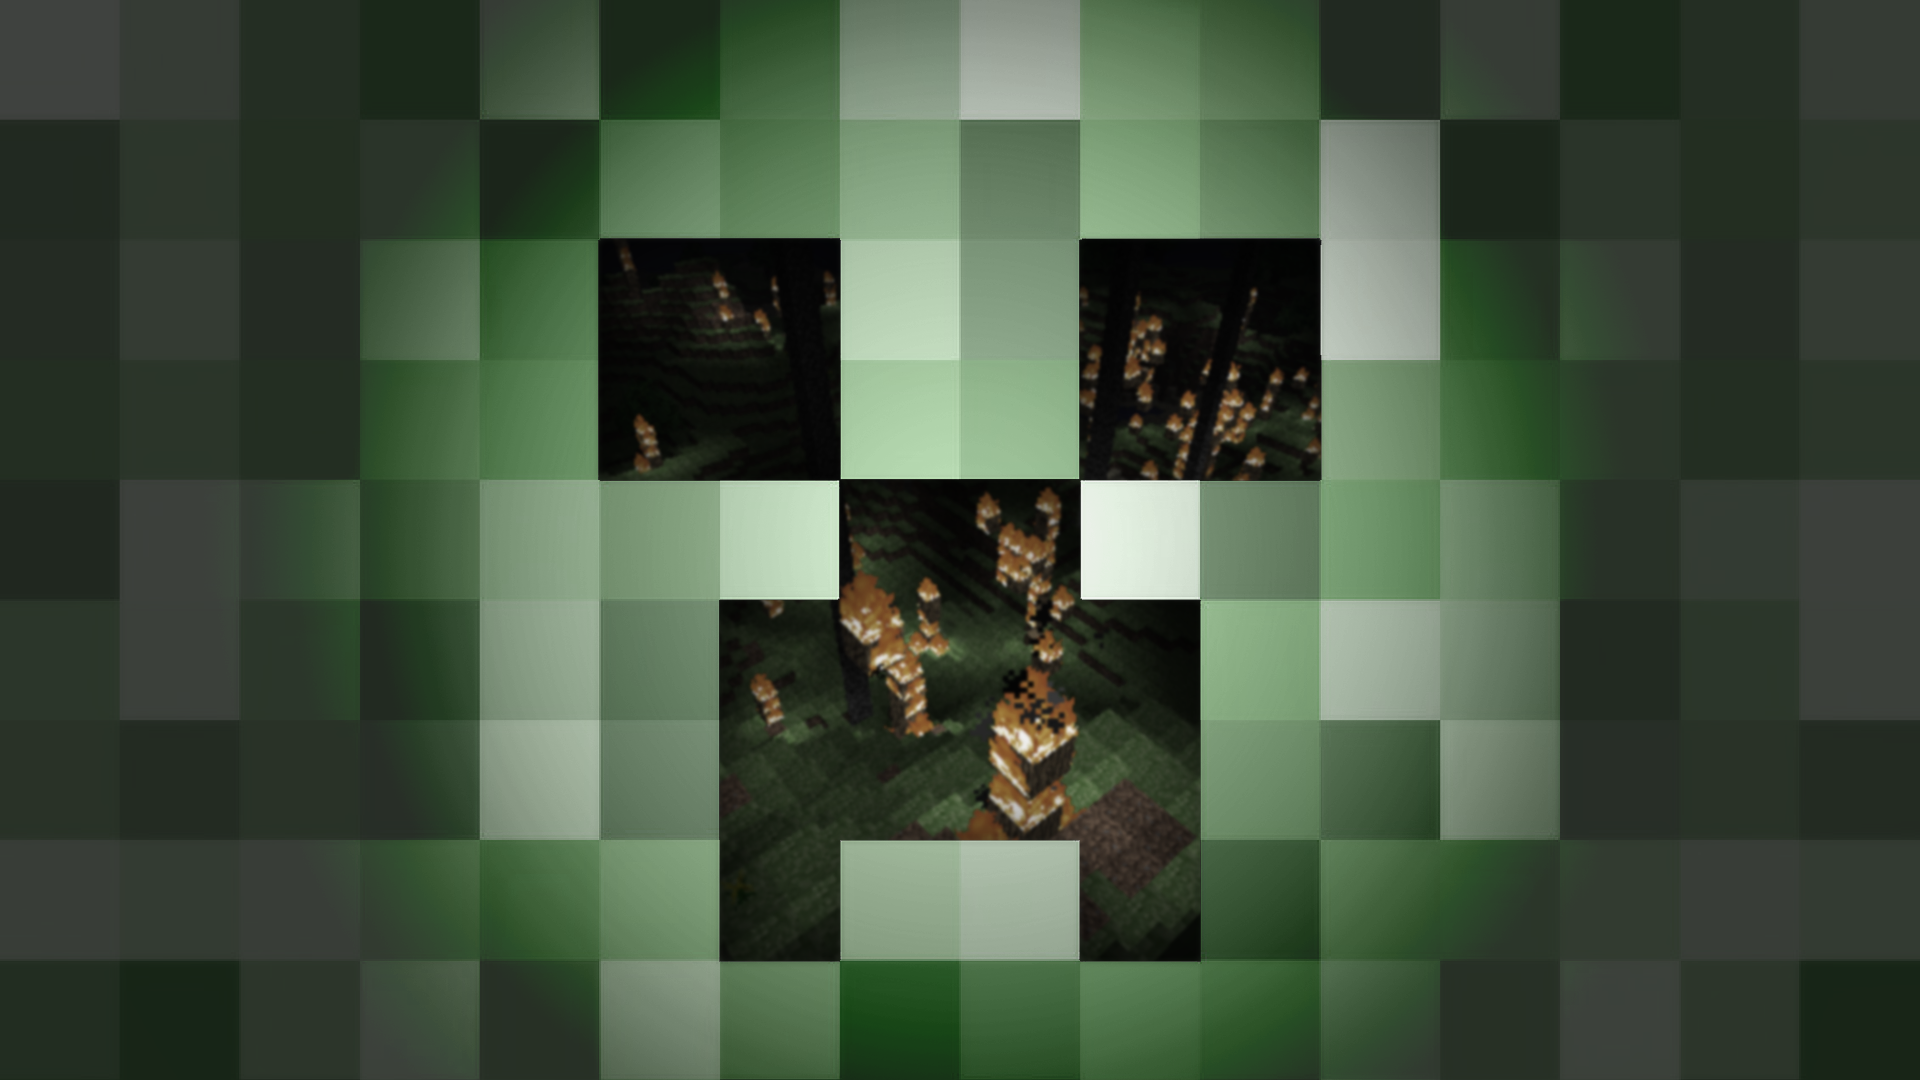 Simple Wallpaper Minecraft Green - minecraft-creeper-wallpaper-1  Graphic_327838.png